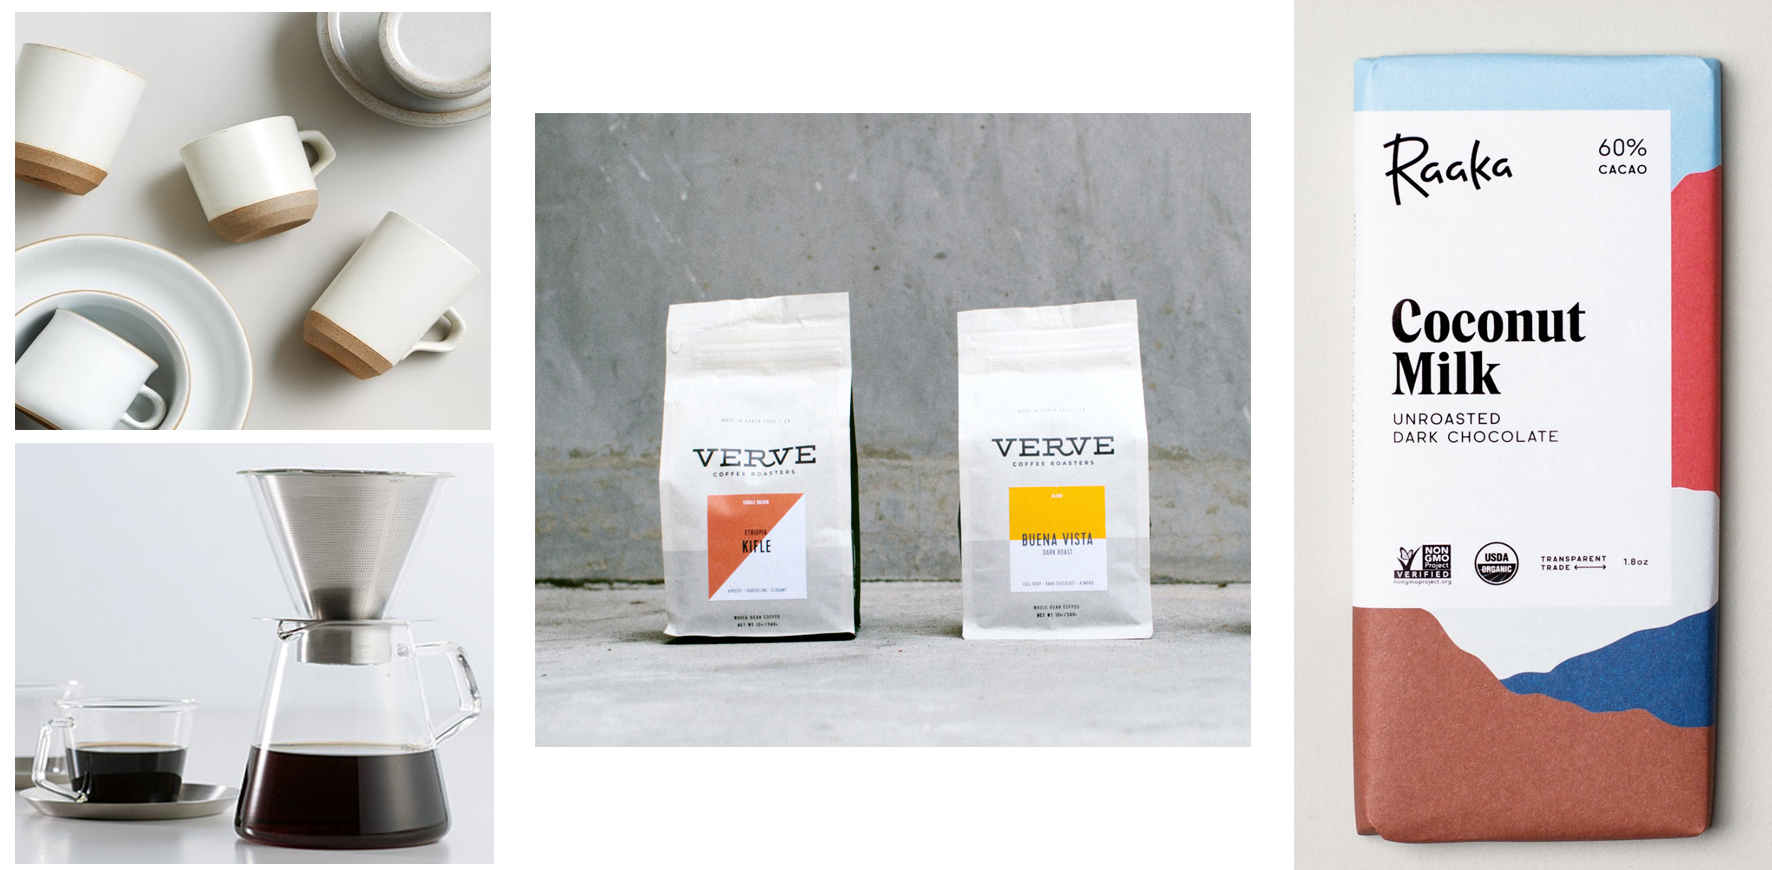 Kinto Ceramic Mug (2), Kinto Coffee Carafe, Verve Coffee Roasters, Raaka Chocolate Bar